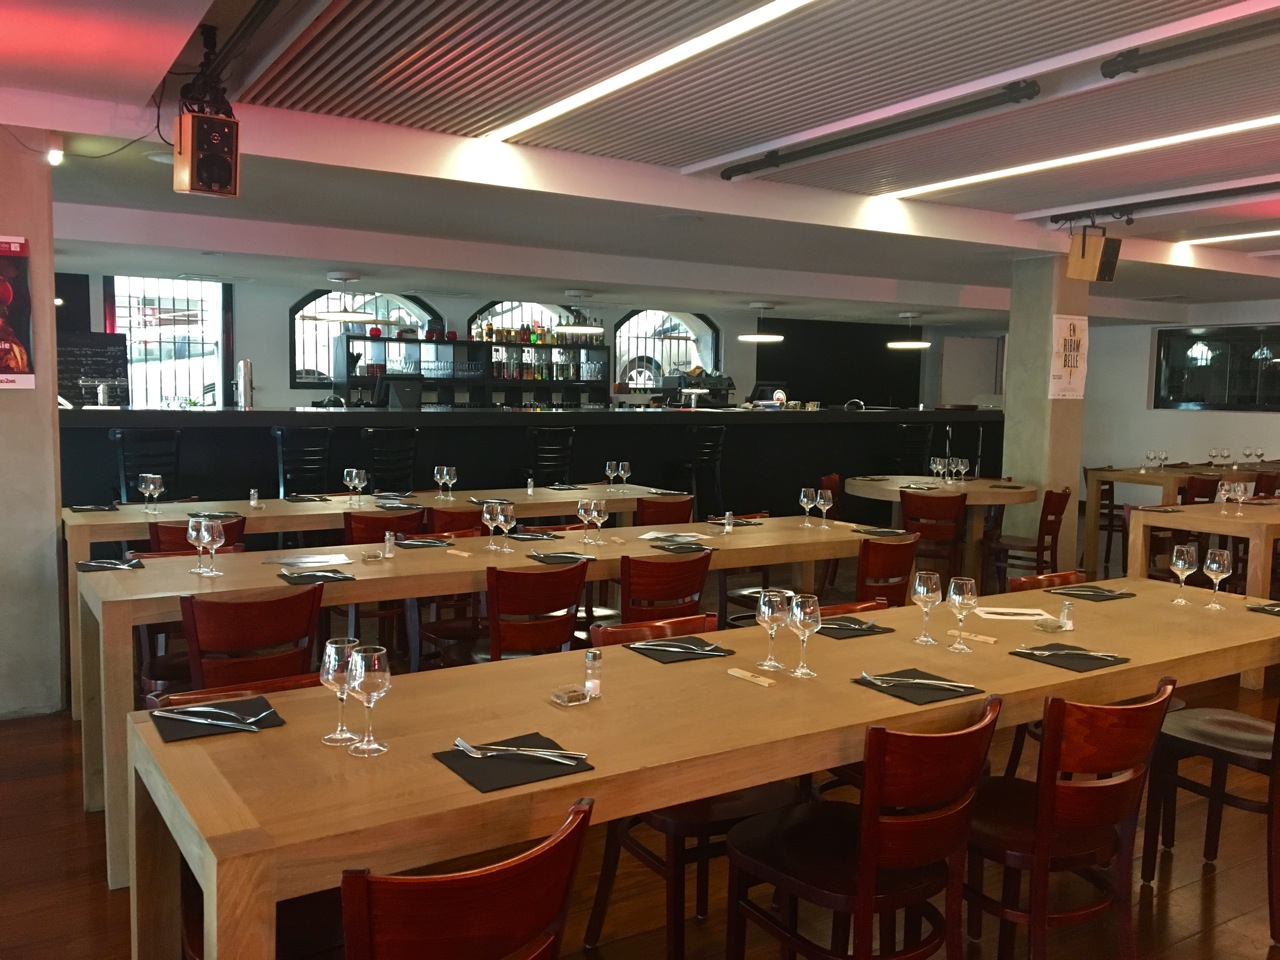 Restaurant vieux port les grandes tables de la cri e - Les grandes tables de la friche ...